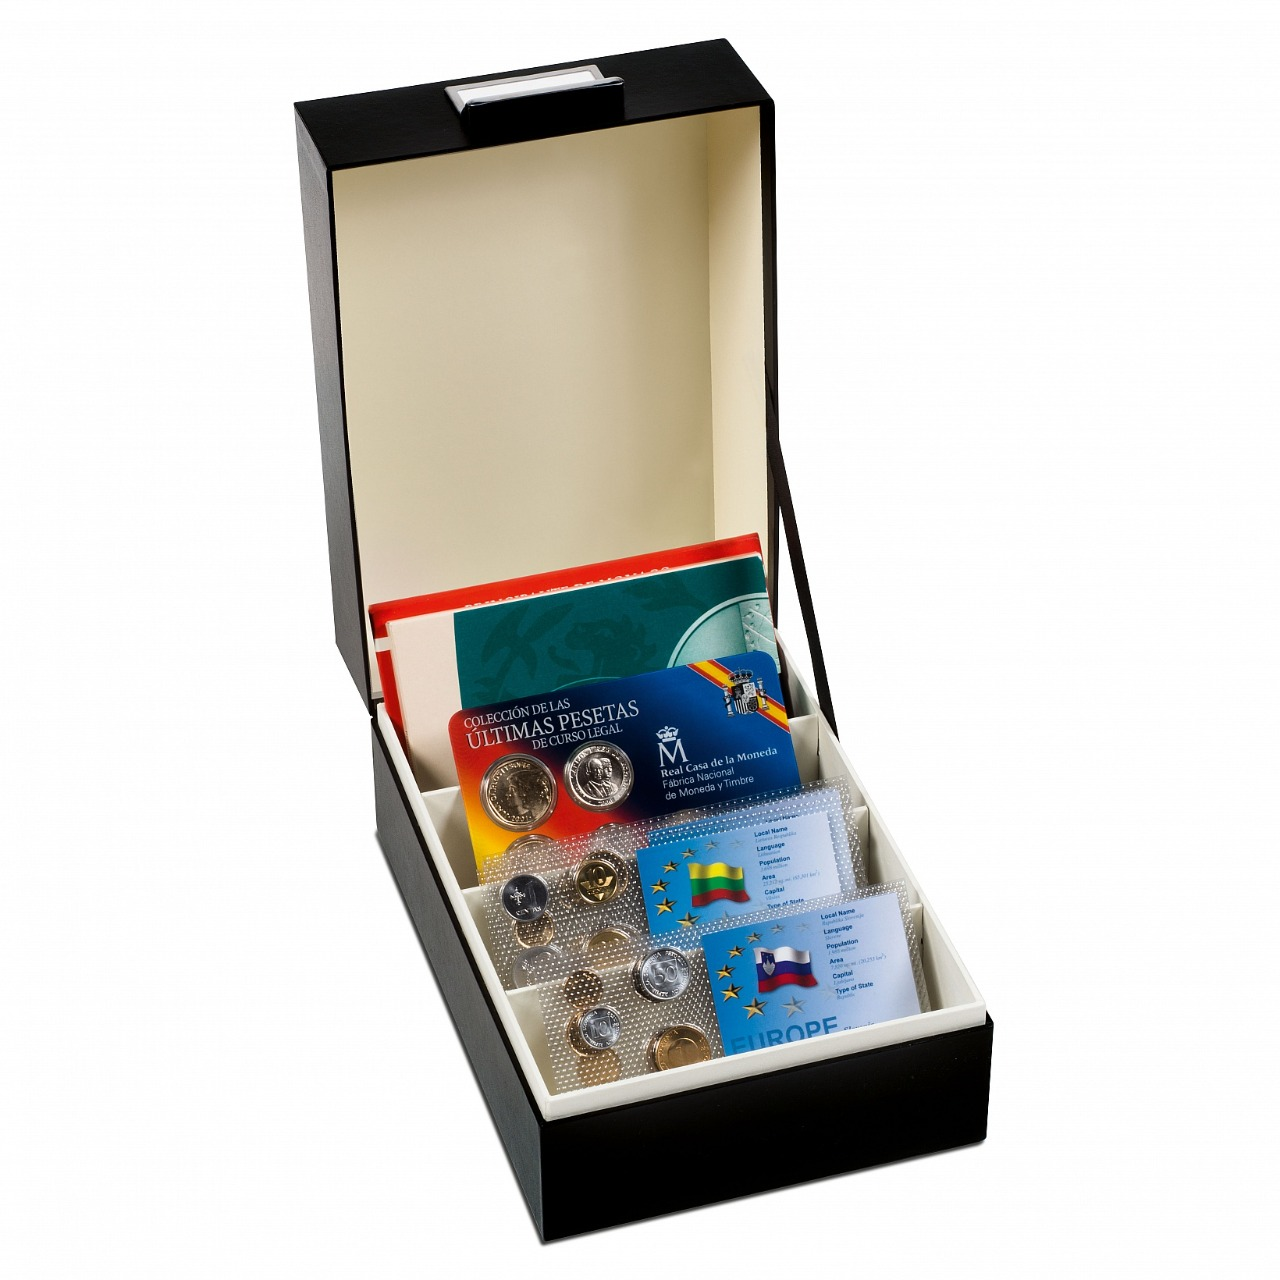 Lighthouse - Logik Archivbox box C6, interior size 180 X 126 X 270 mm, black